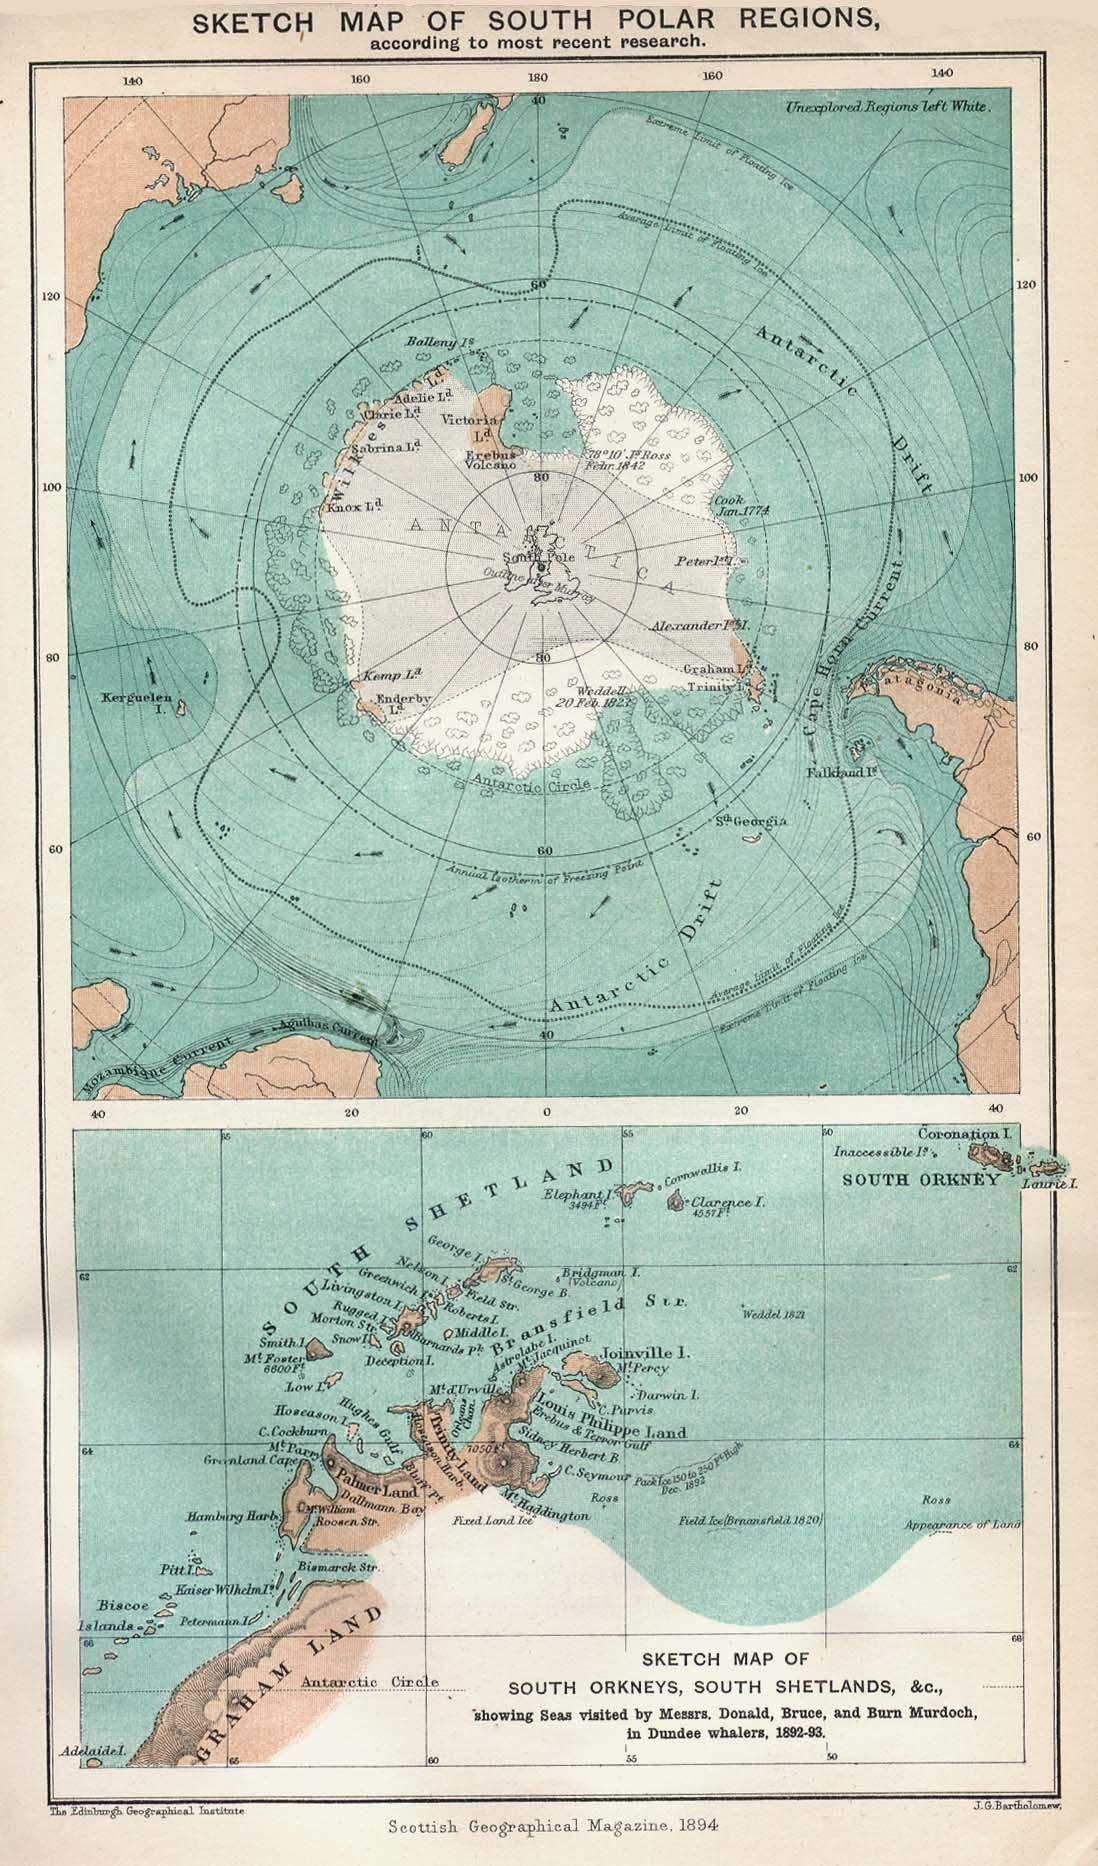 5 Must Read Books on Antarctic History